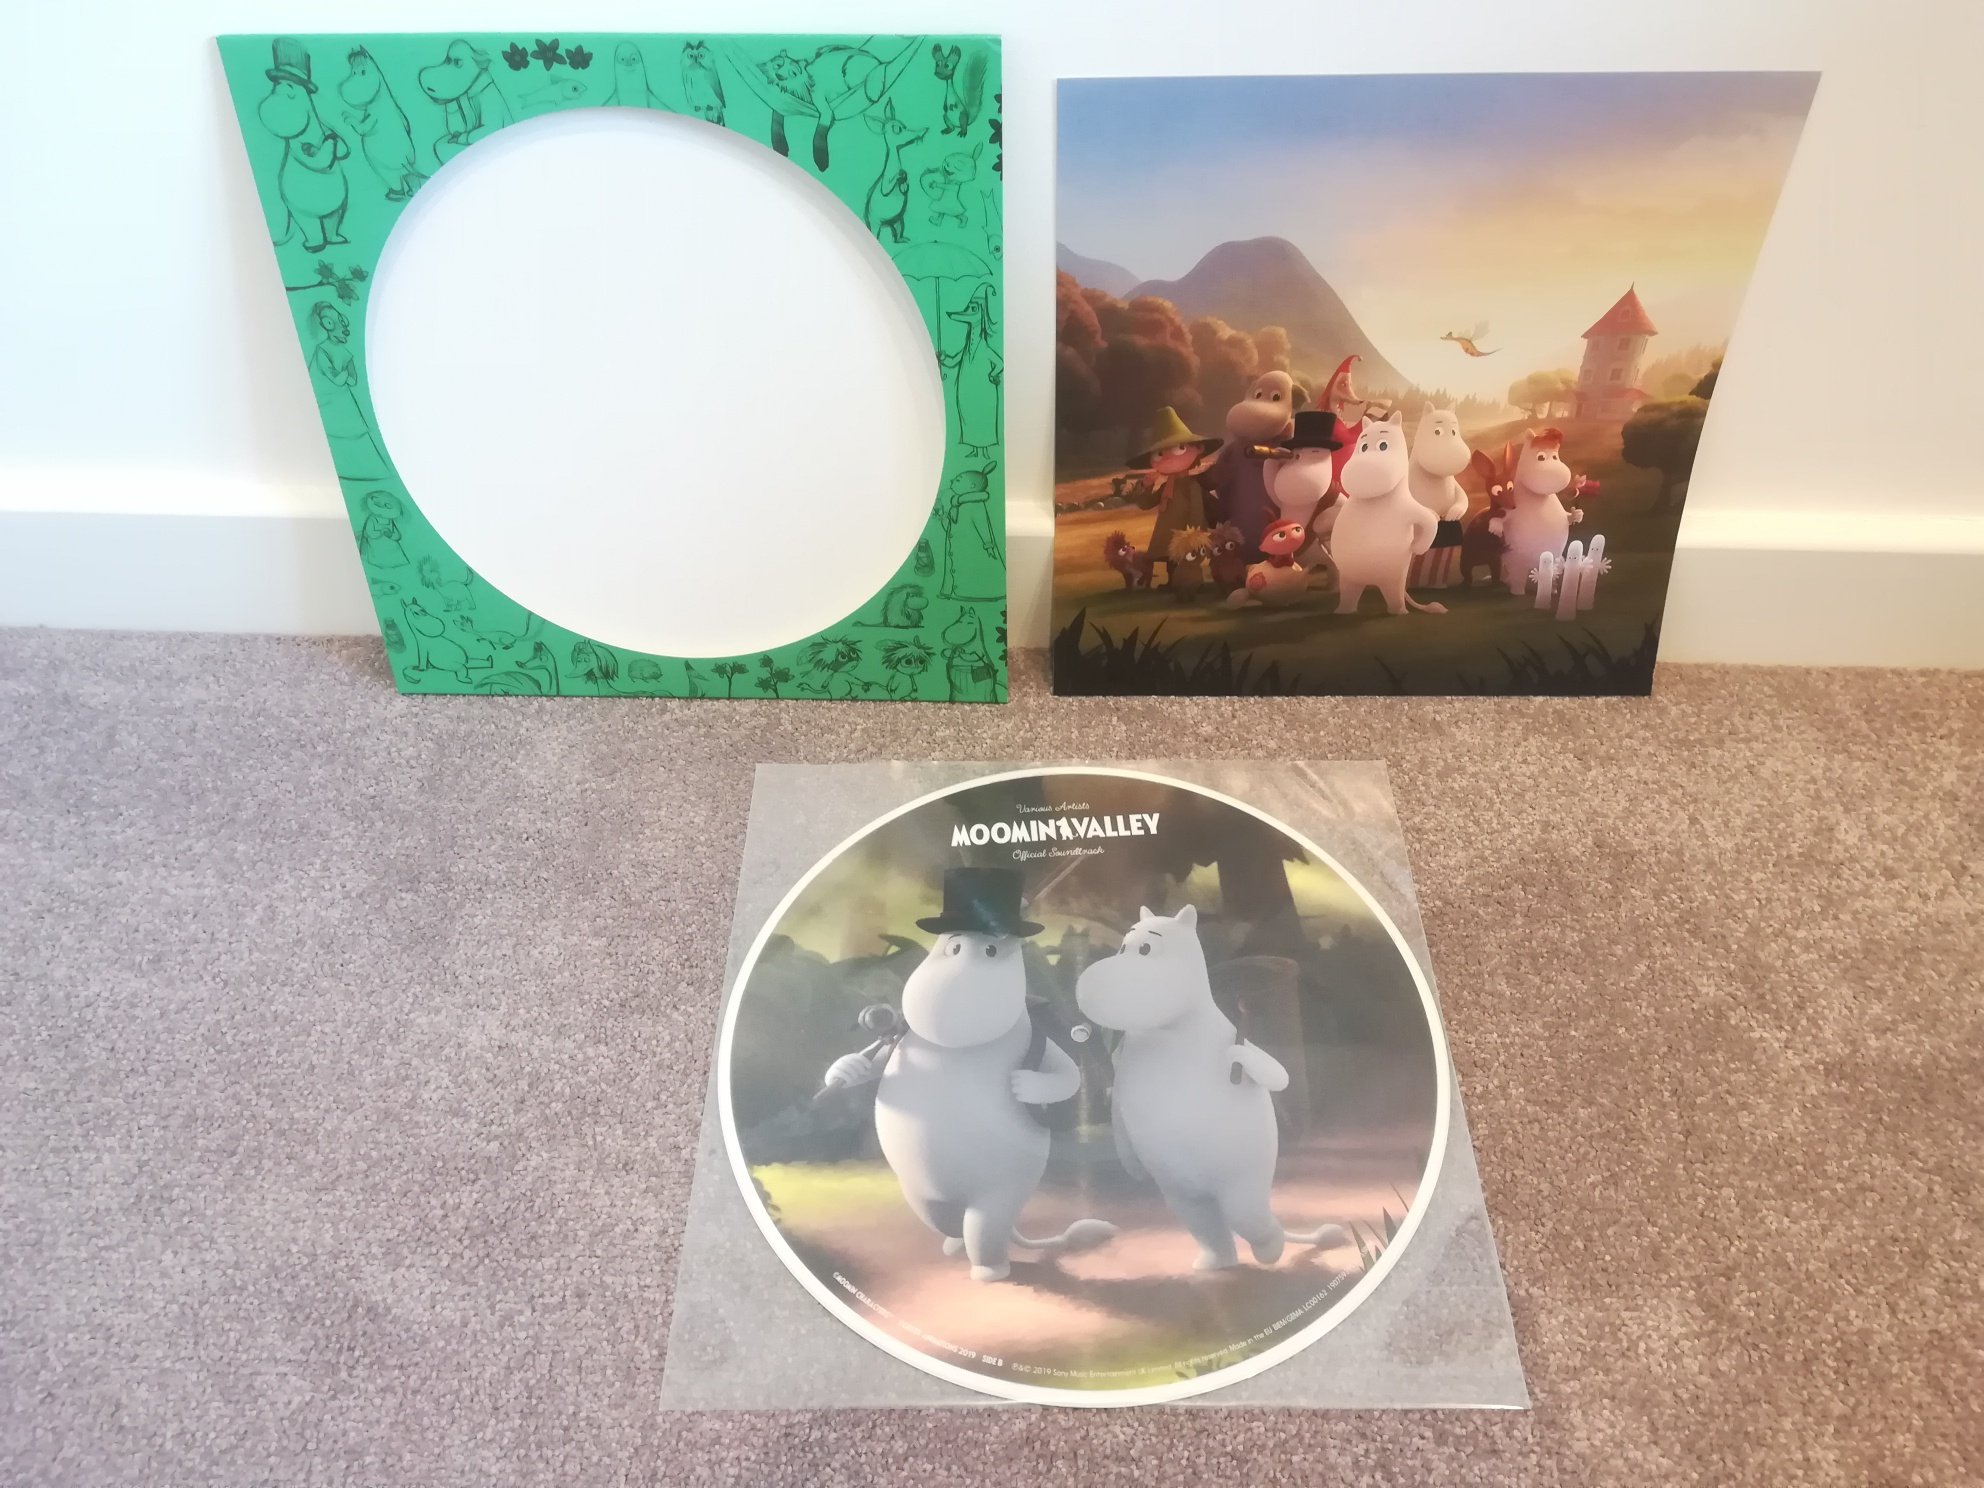 Moominvalley Soundtrack on Vinyl